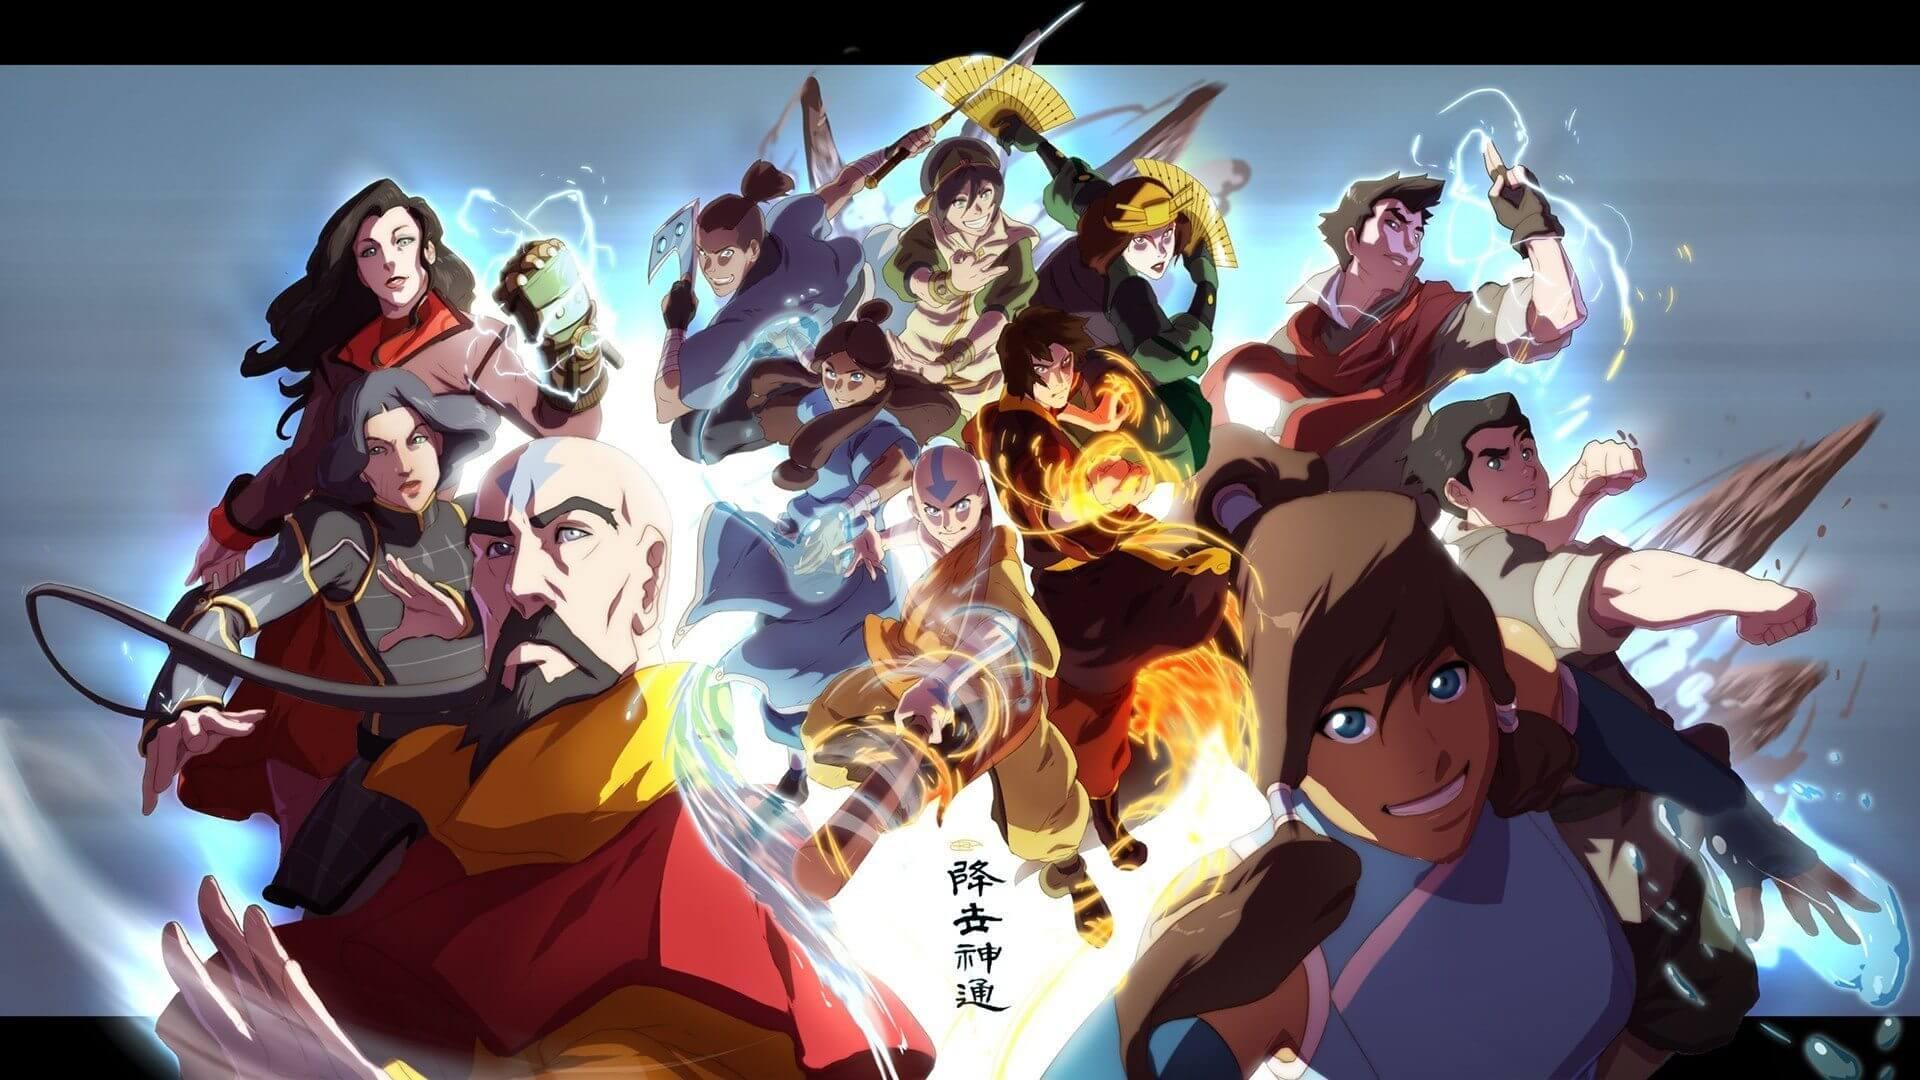 avatar the legend of korra widescreen wallpaper - Steam: fim de semana de anime games